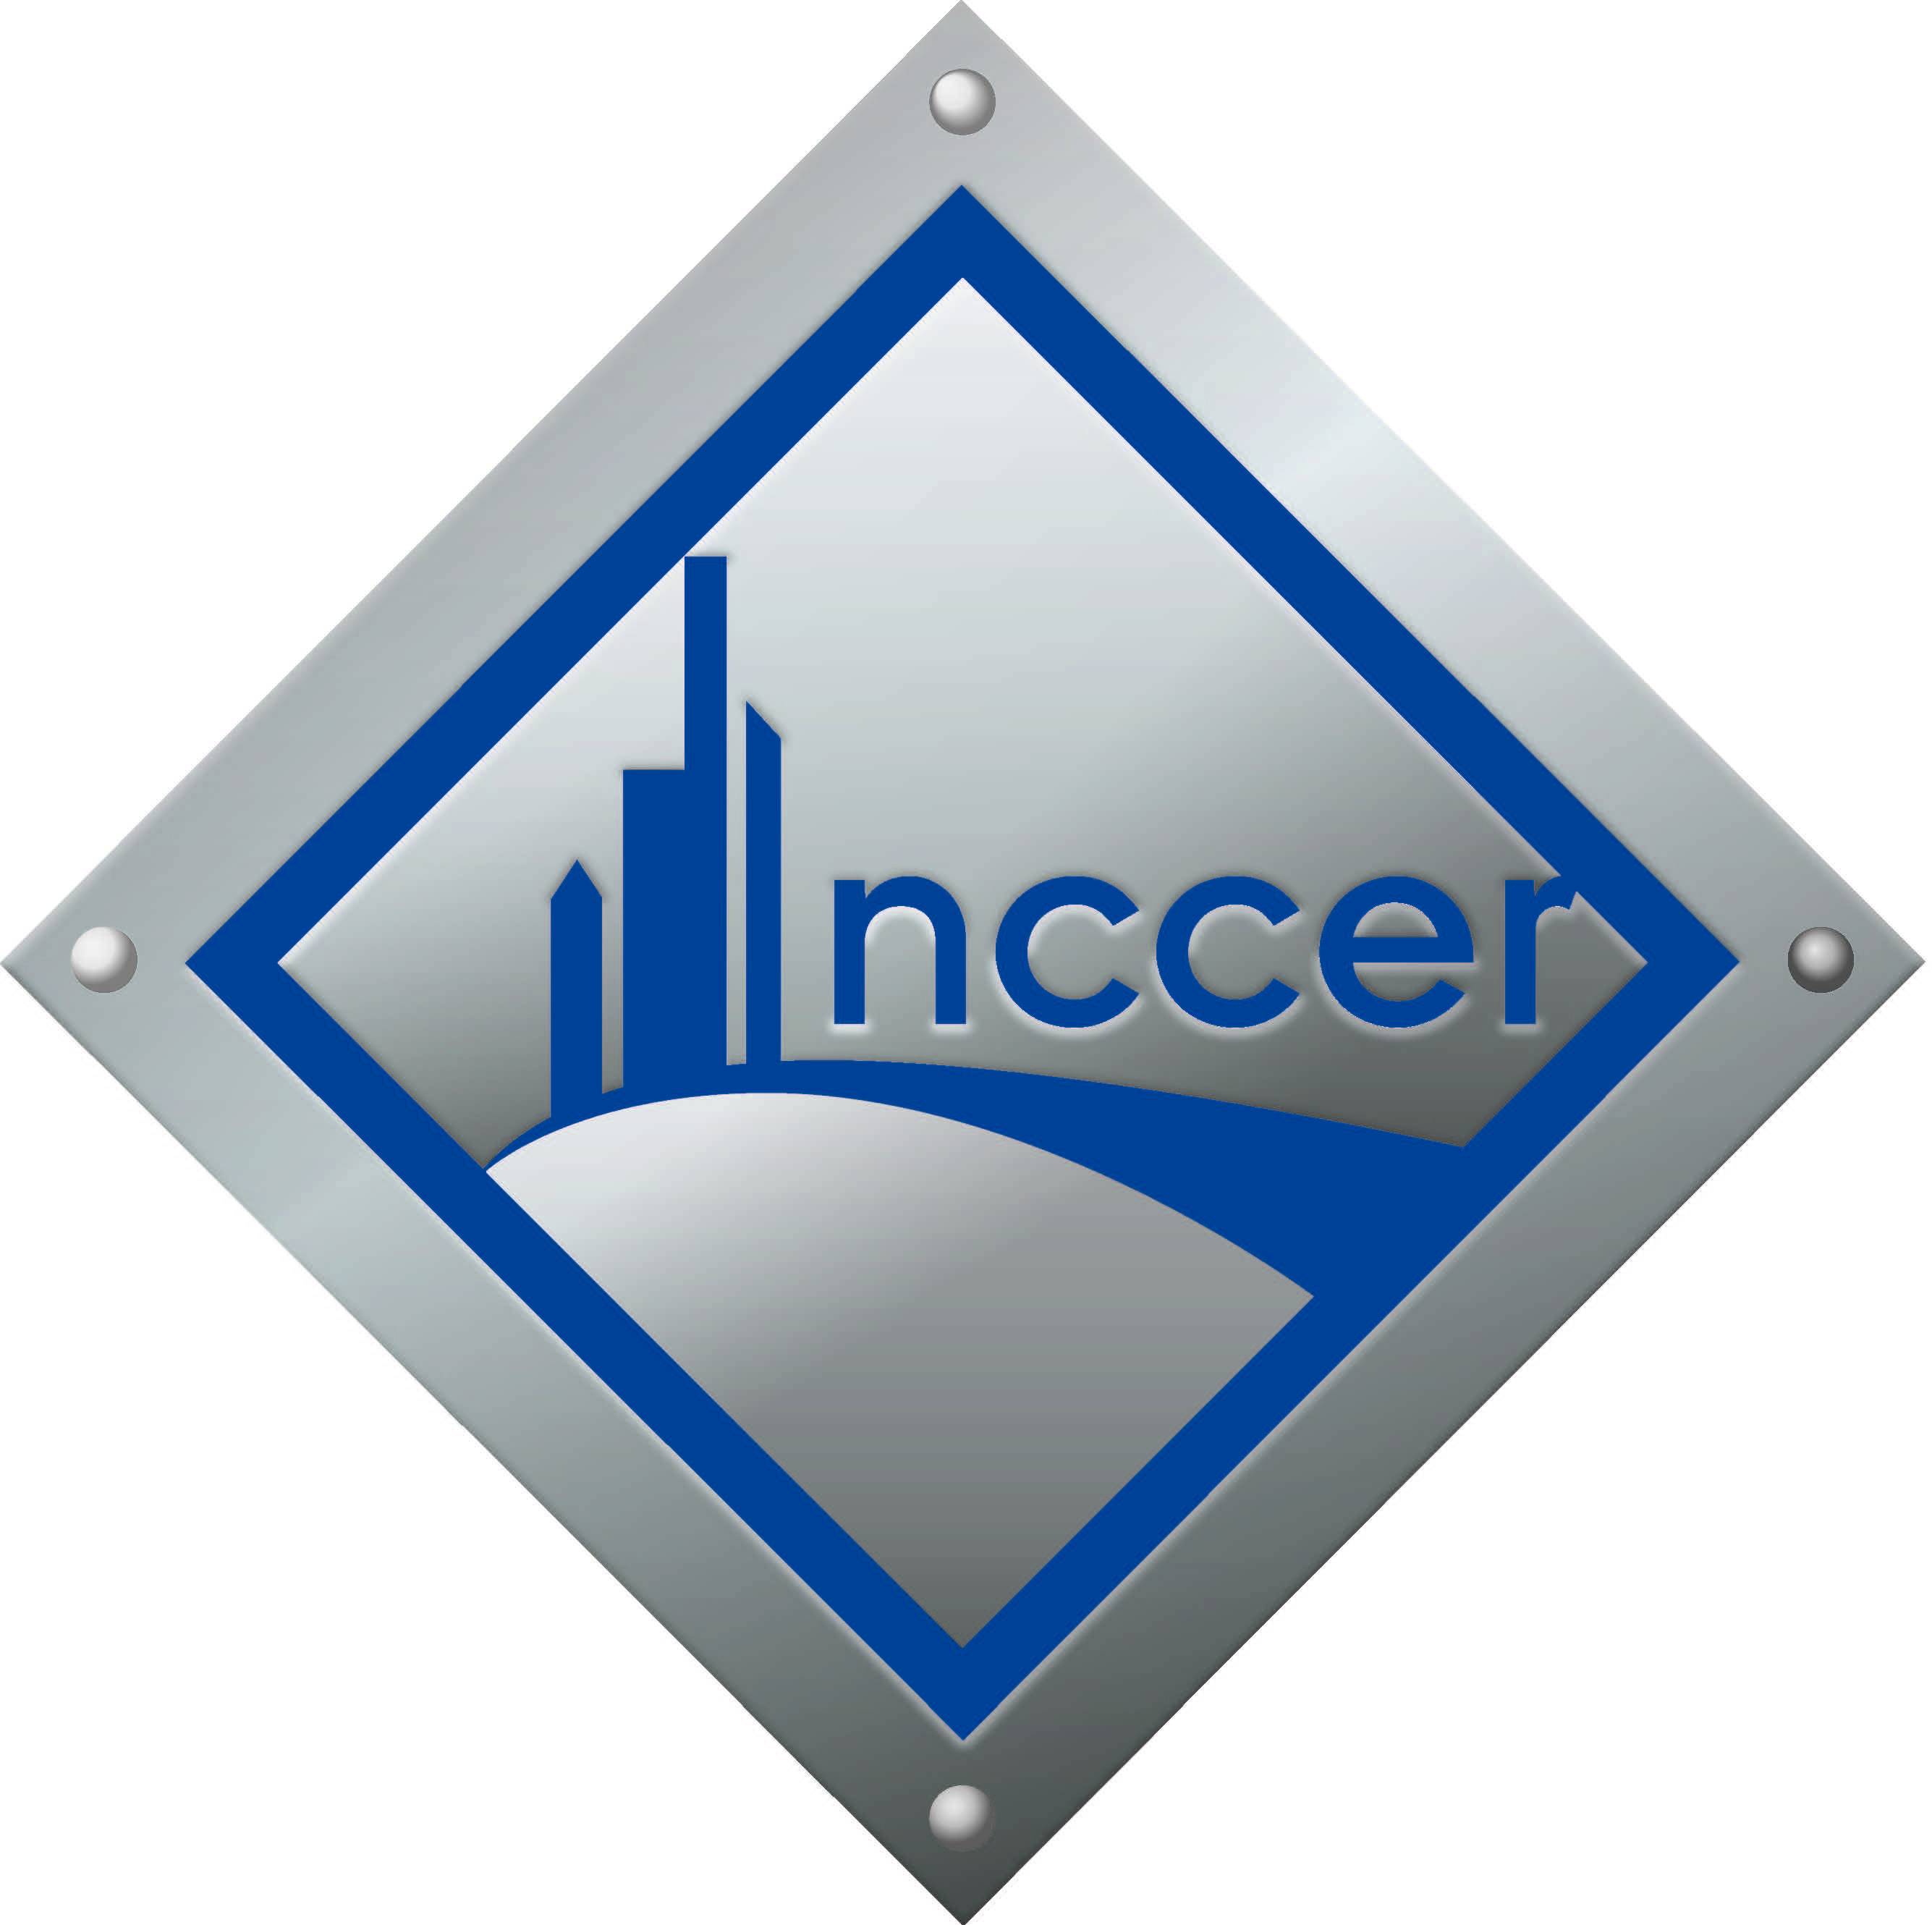 http://www.nccer.org/